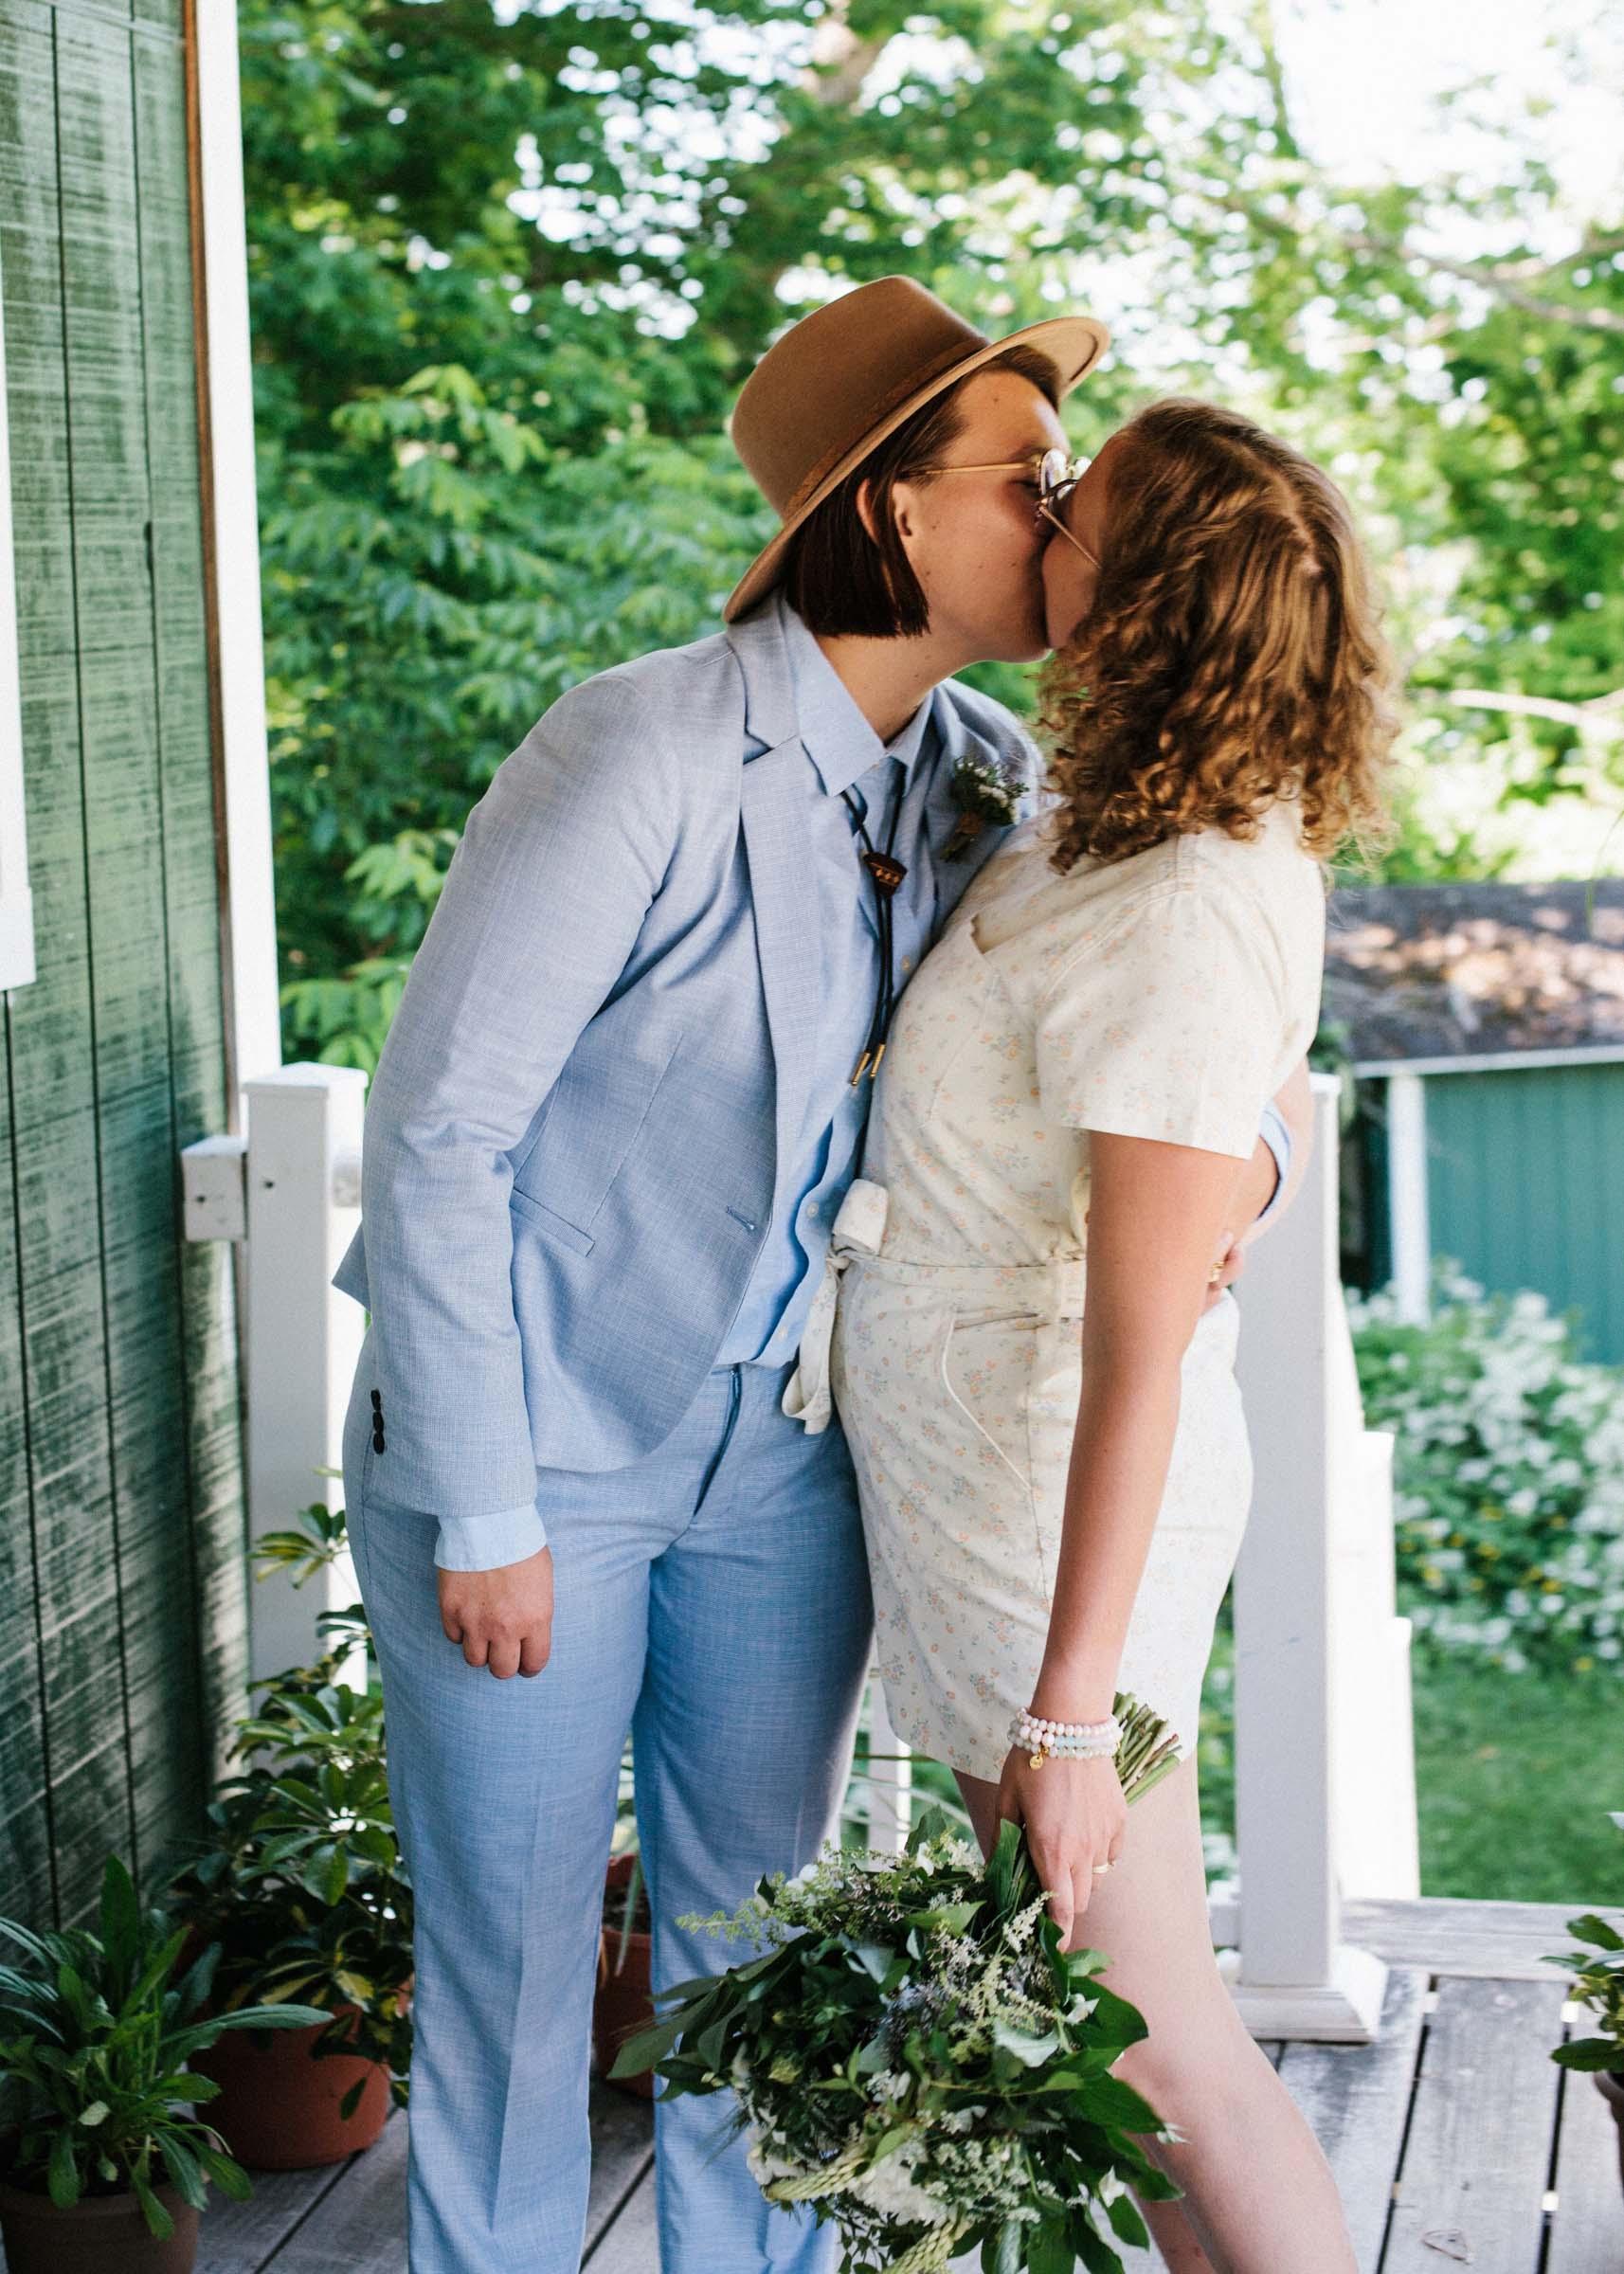 Dan McMahon lesbian lgbt+ same-sex elopement wedding Danville Vermont USA America Dancing With Her